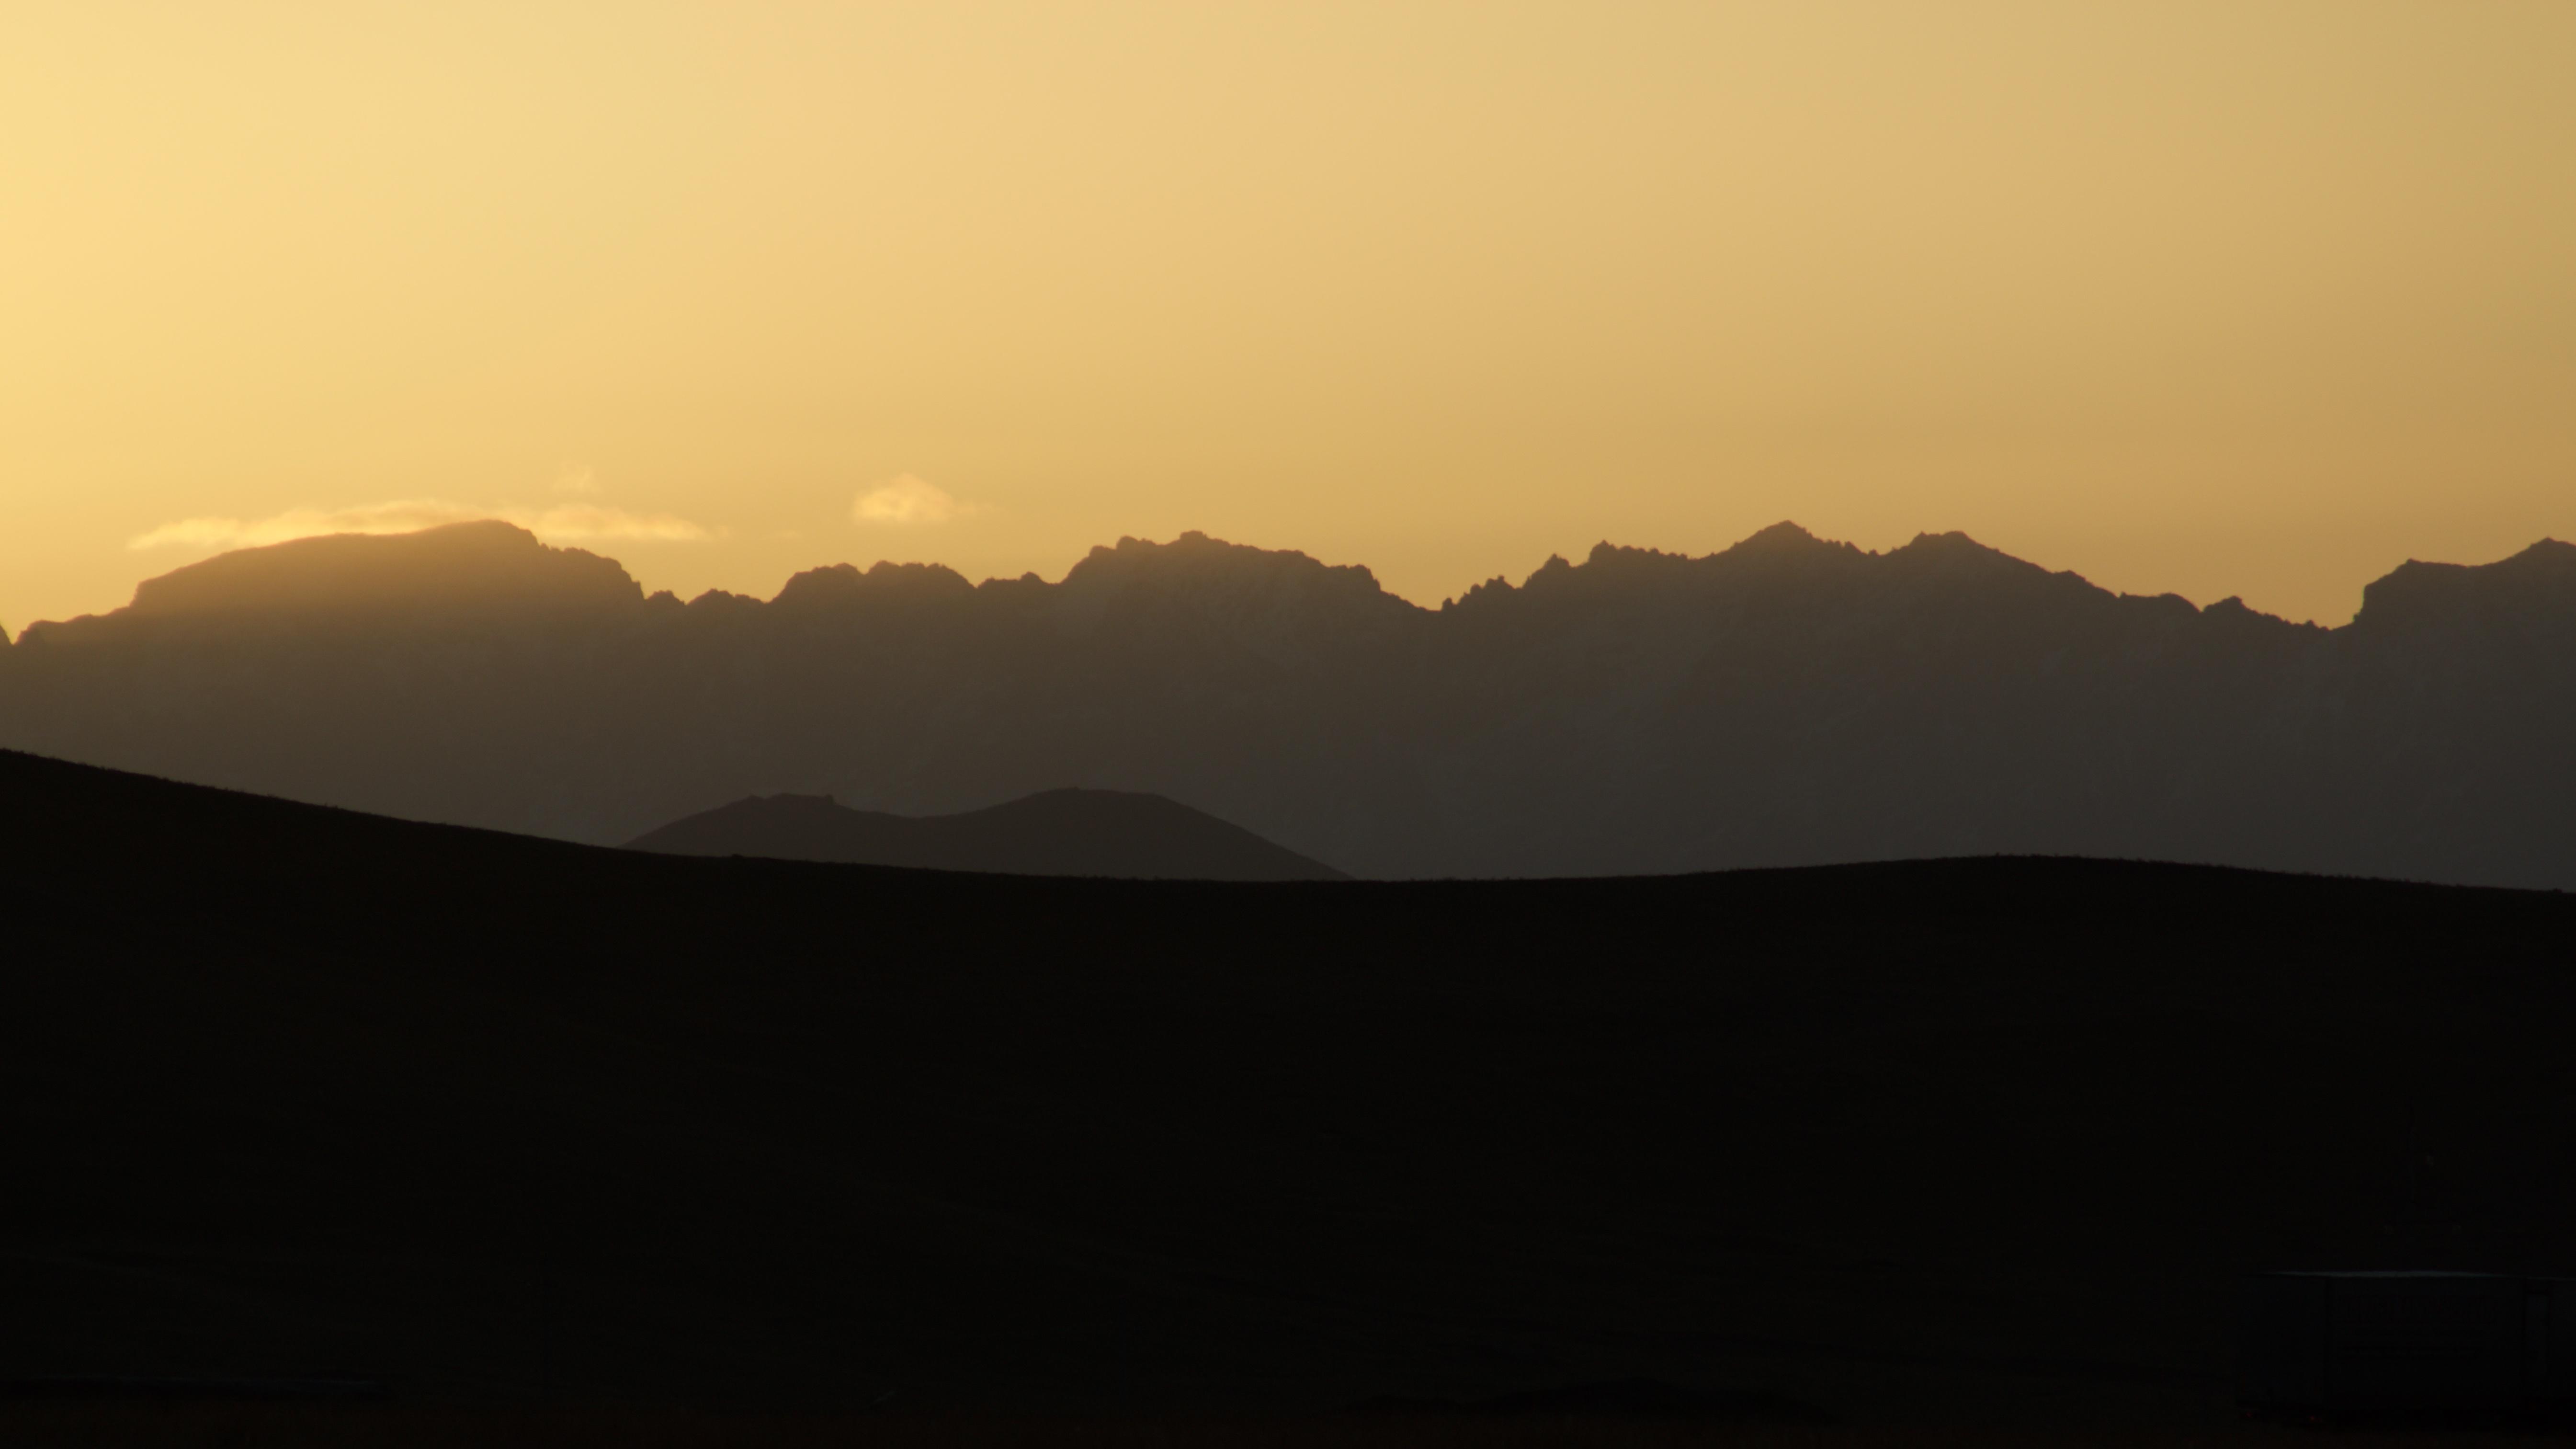 Osh Province Kyrgyzstan Sunrise Sunset Times